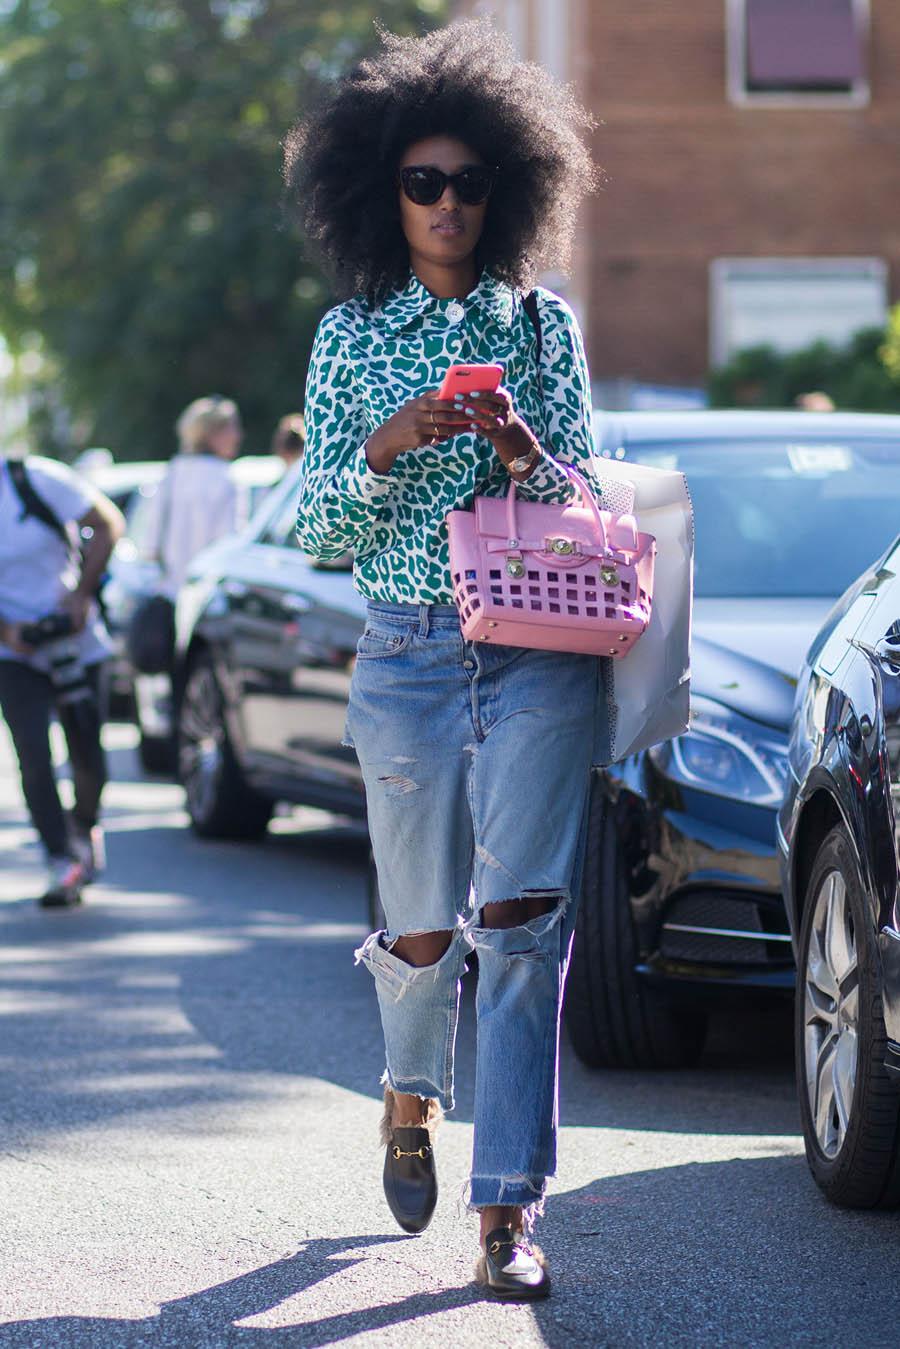 julia-sarr-jamois-leopard-shirt-street-style-main